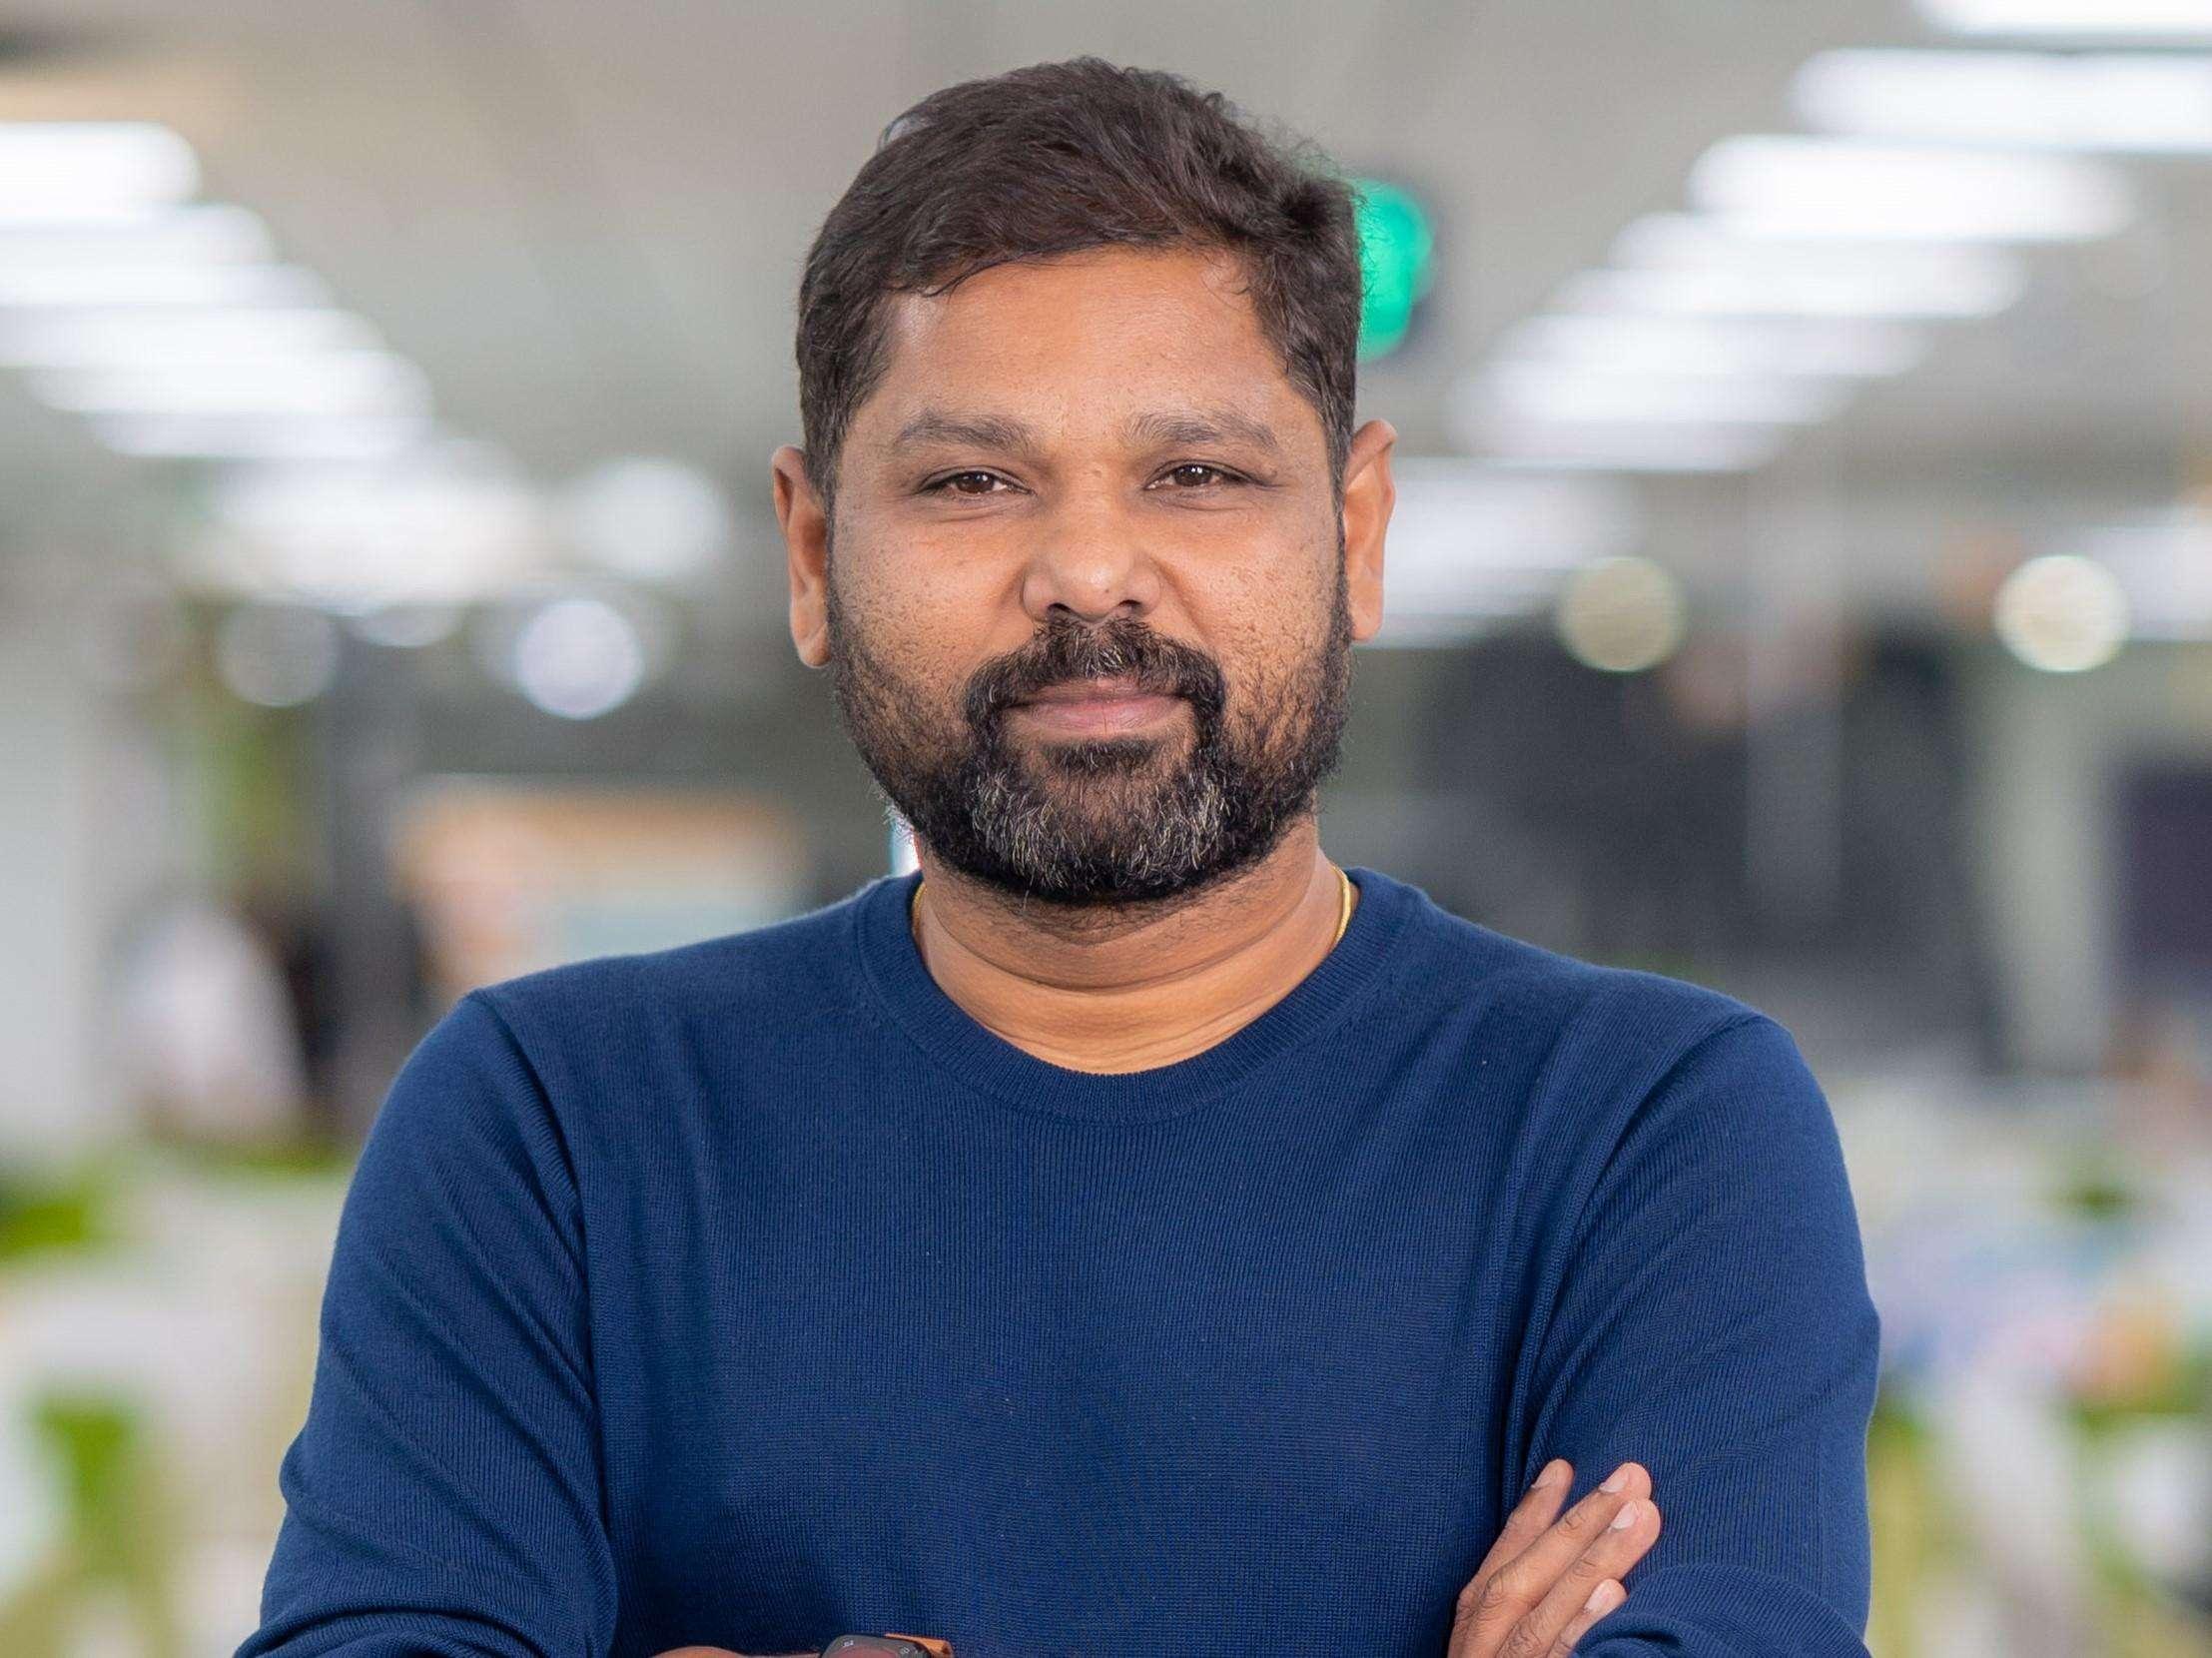 Freshworks CEO Girish Mathrubootham